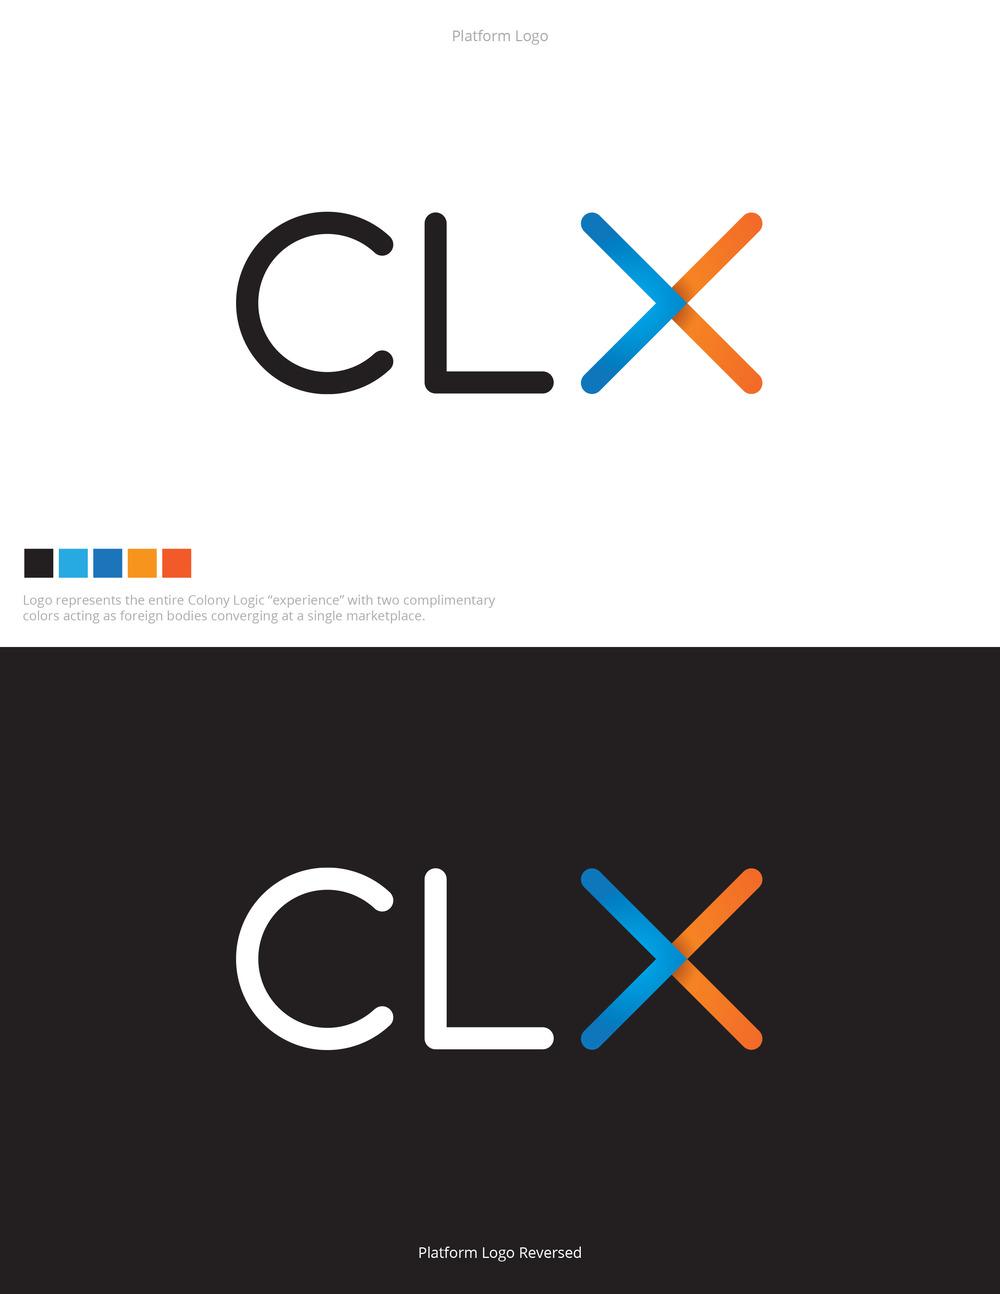 CLX PLATFORM